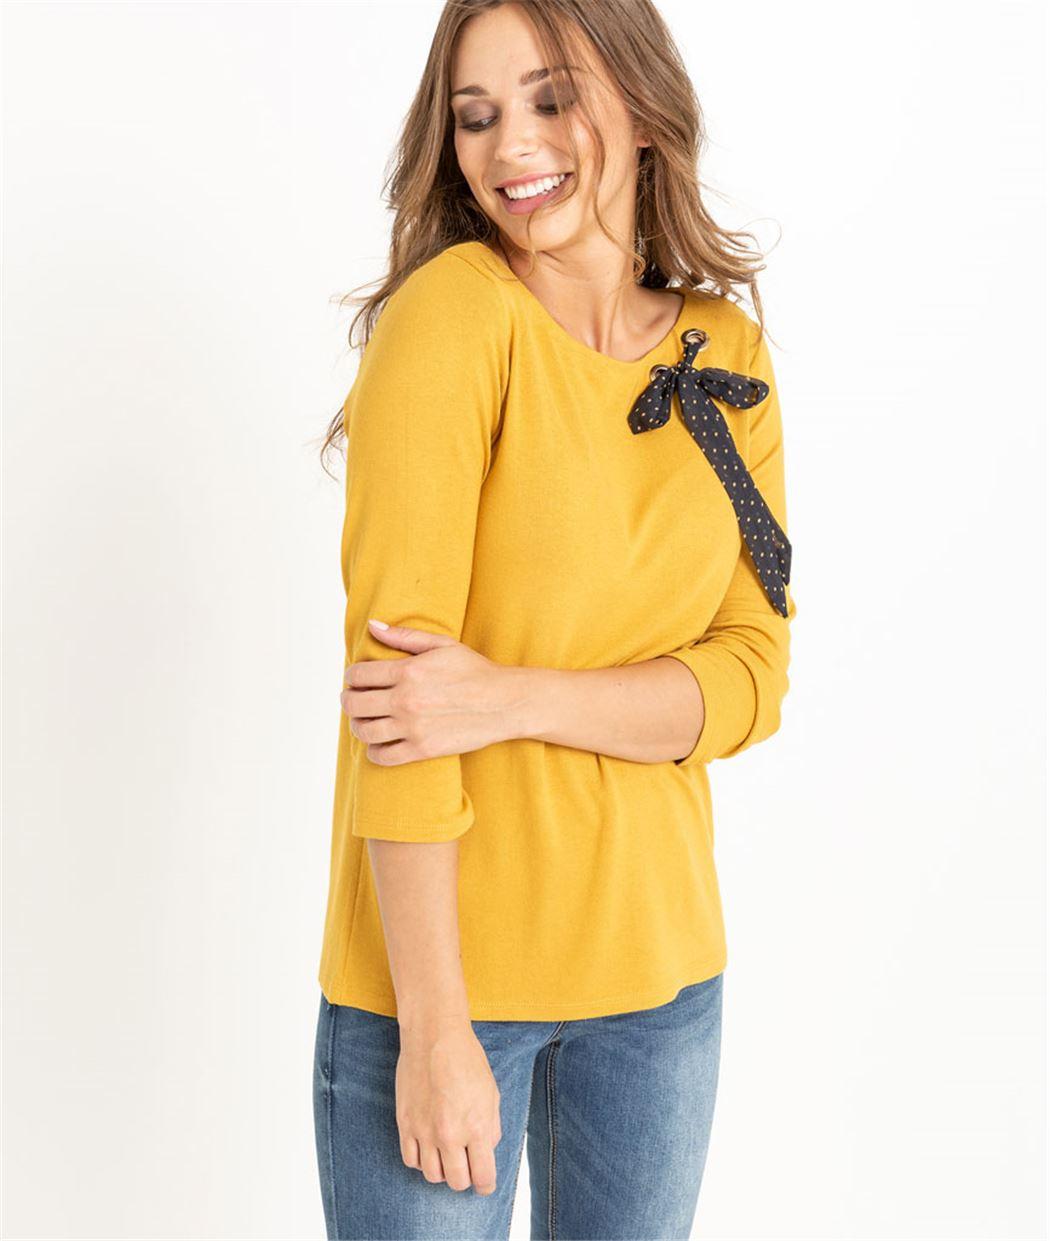 T-shirt femme safran avec noeud SAFRAN